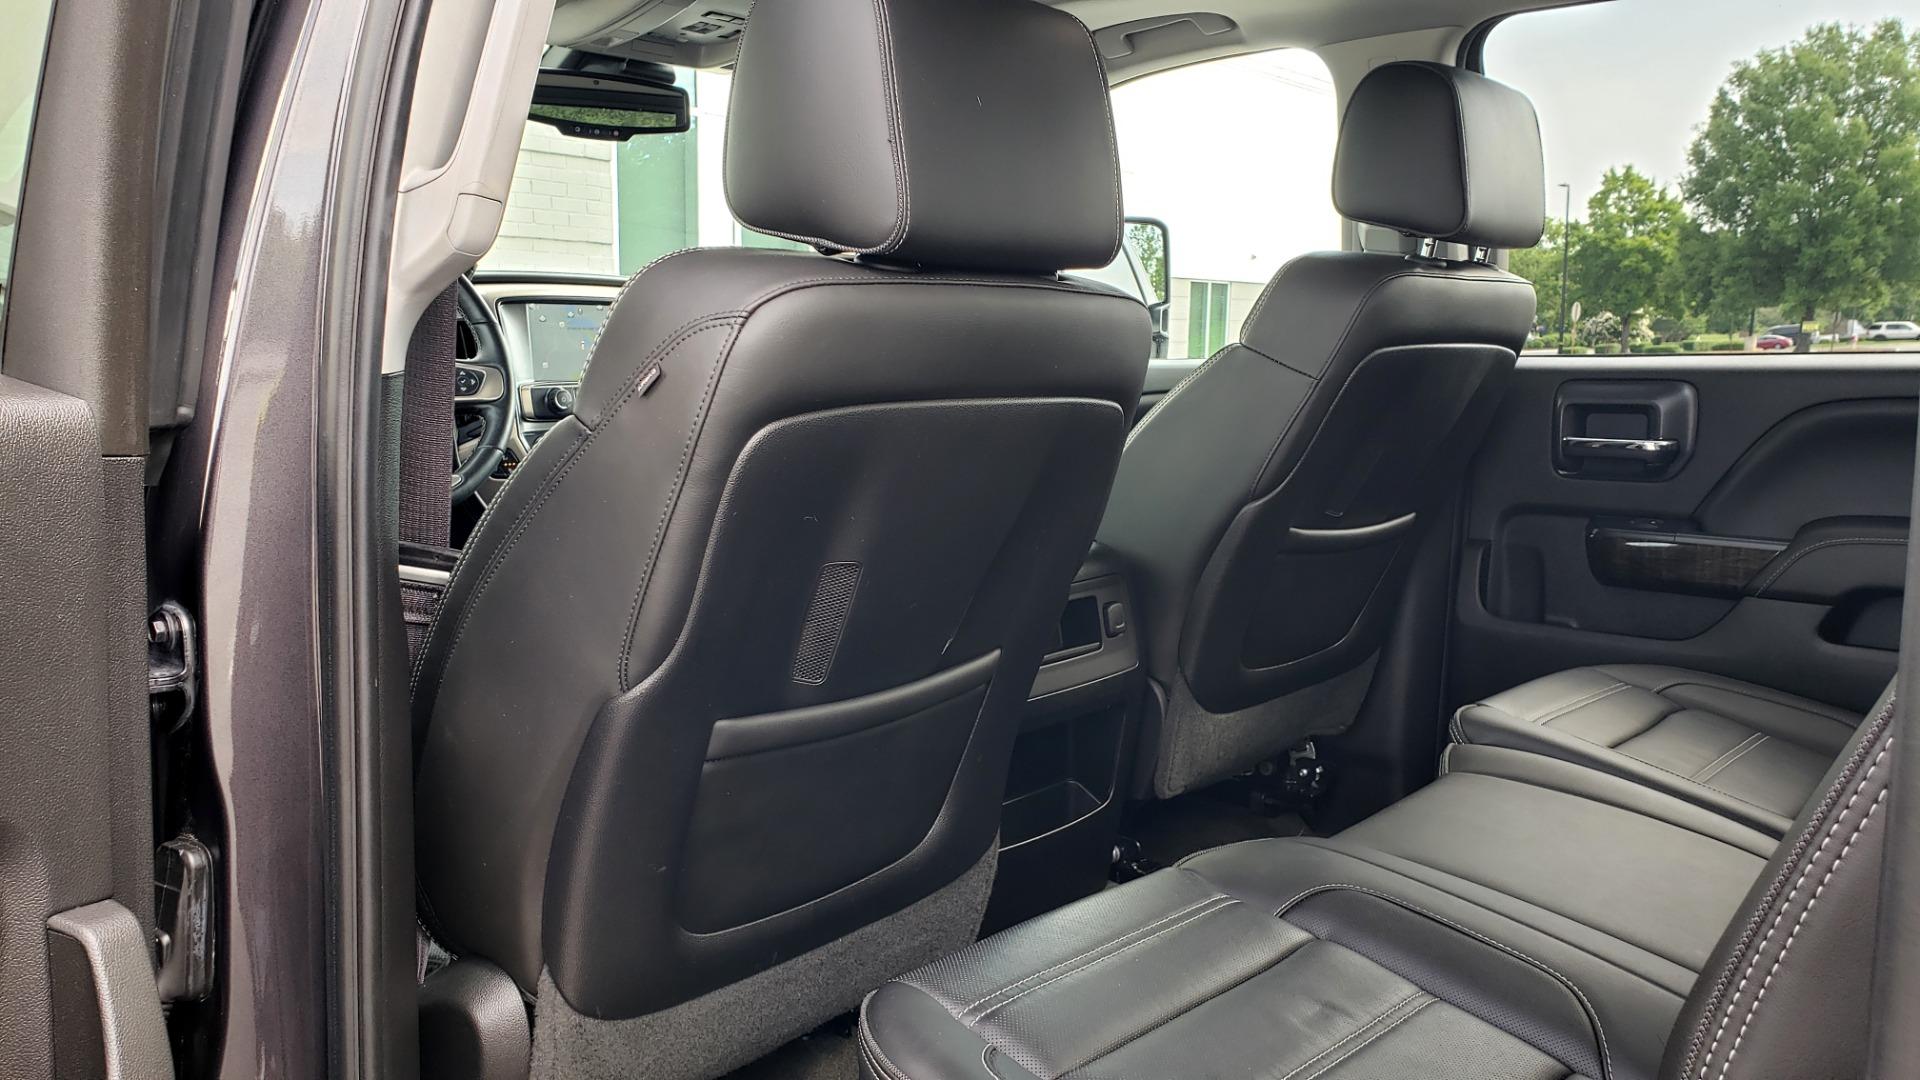 Used 2015 GMC SIERRA 2500HD DENALI / WIFI / NAV / DURAMAX PLUS / DRVR ALERT / SUNROOF / REARVIEW for sale $56,995 at Formula Imports in Charlotte NC 28227 55